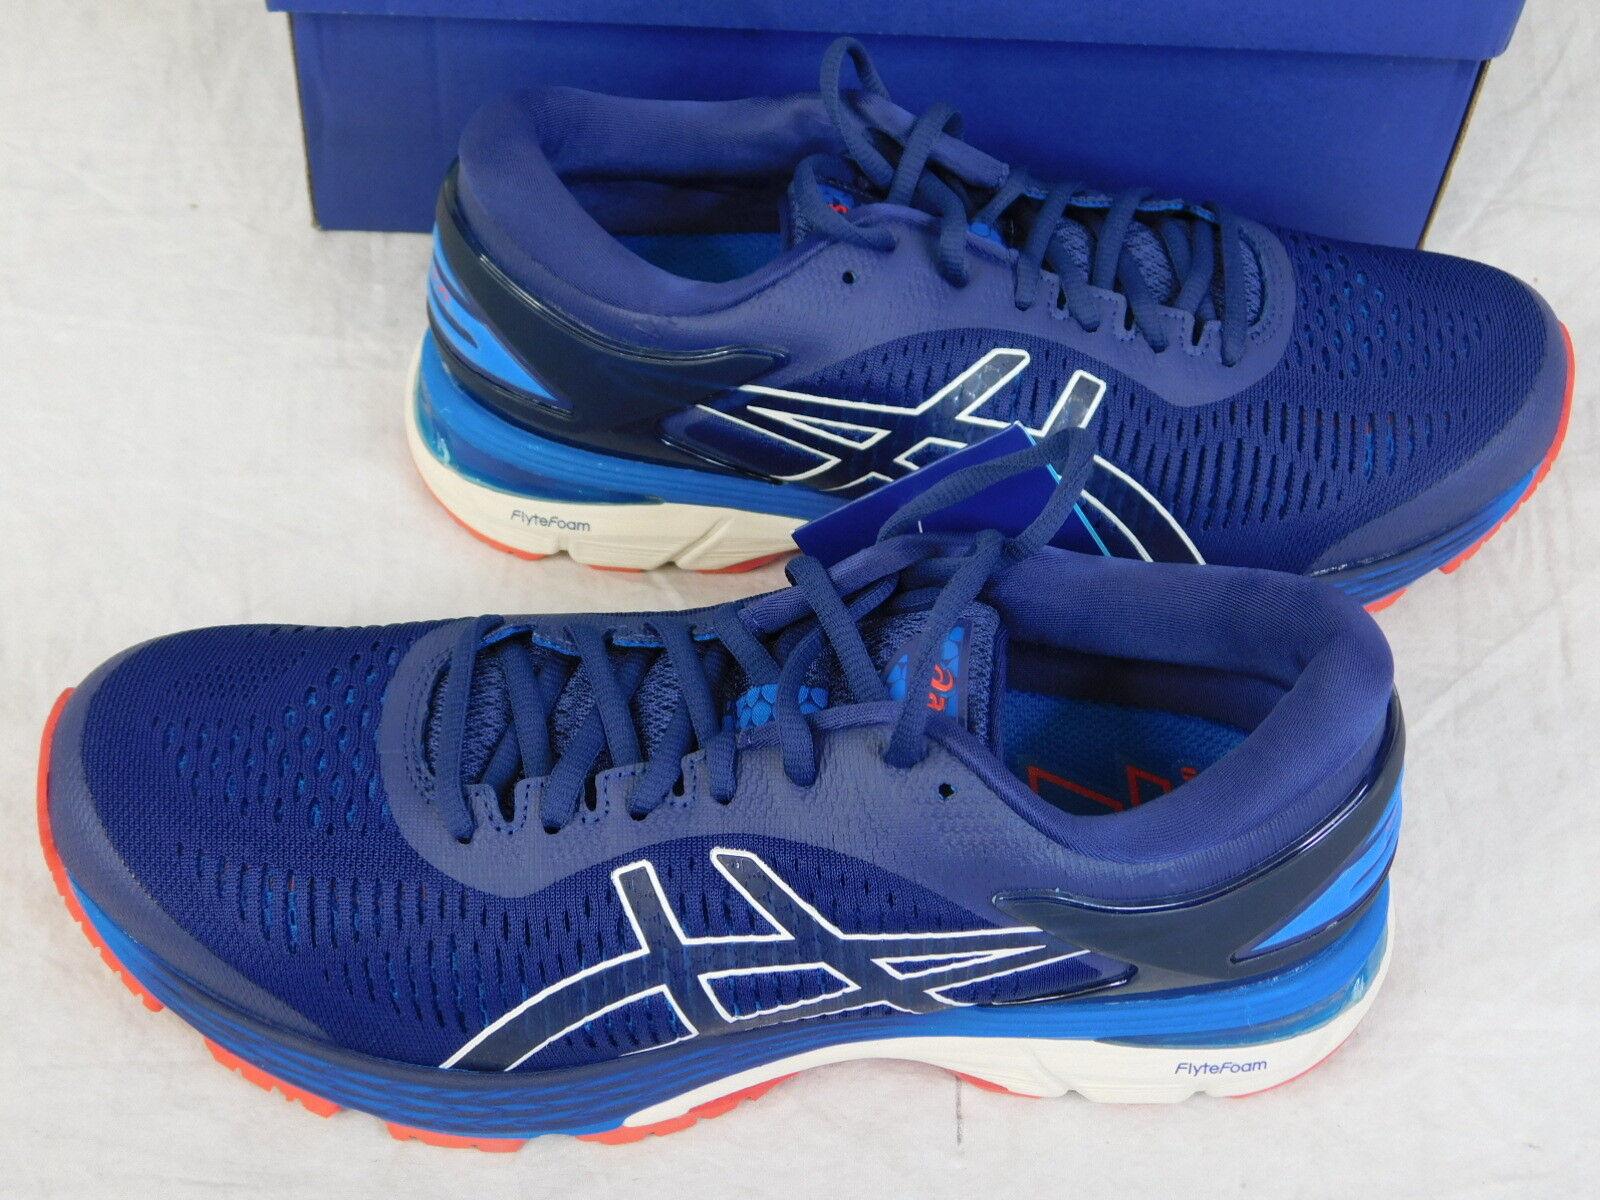 Asics Men's Running scarpe da ginnastica Gel-Kayano 25 Indigo blu Cream 1011A019-400 NOB